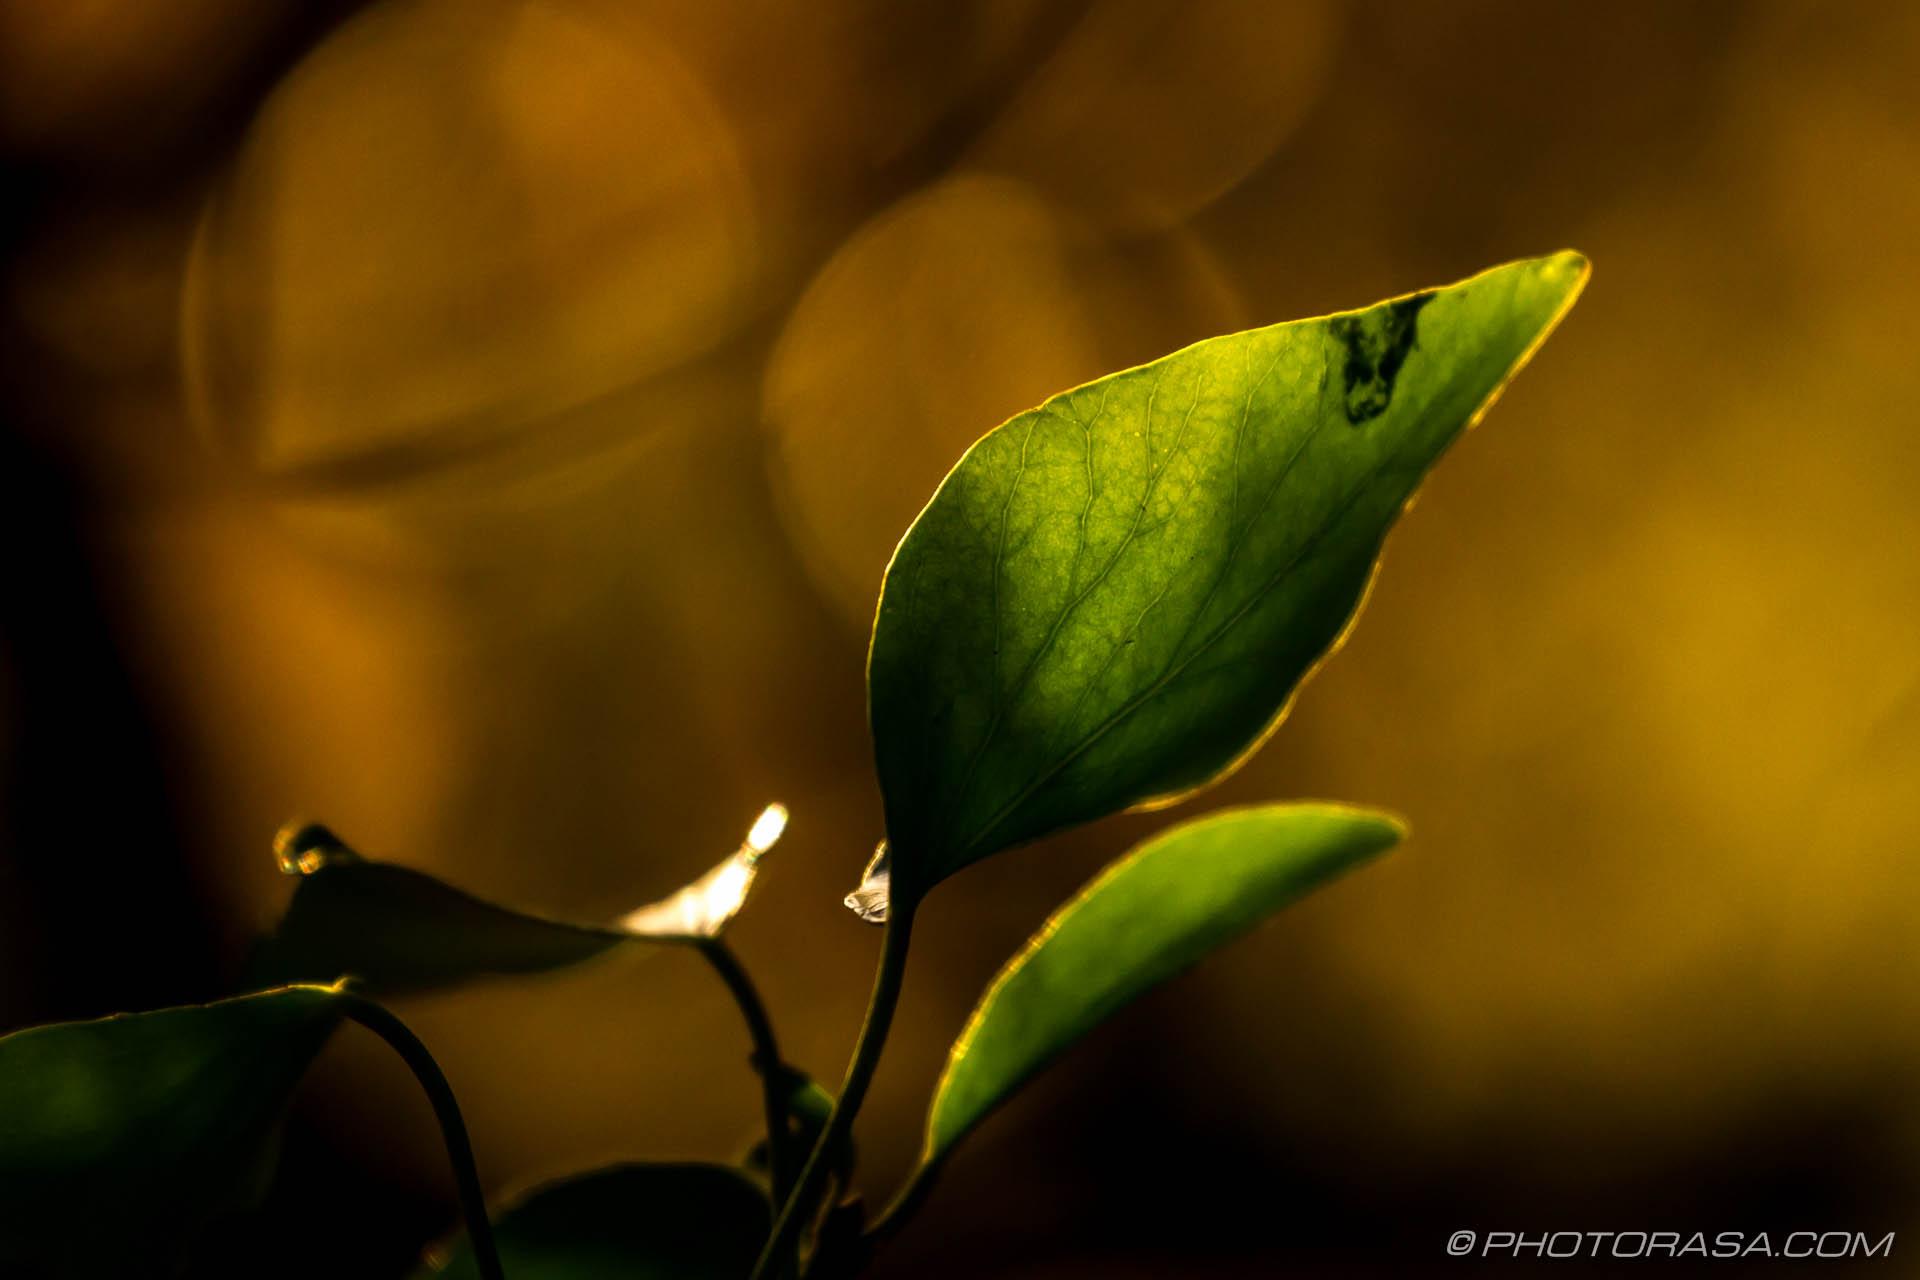 http://photorasa.com/autumn-leaves-sunlight/green-vine-leaf-and-opaque-veins/